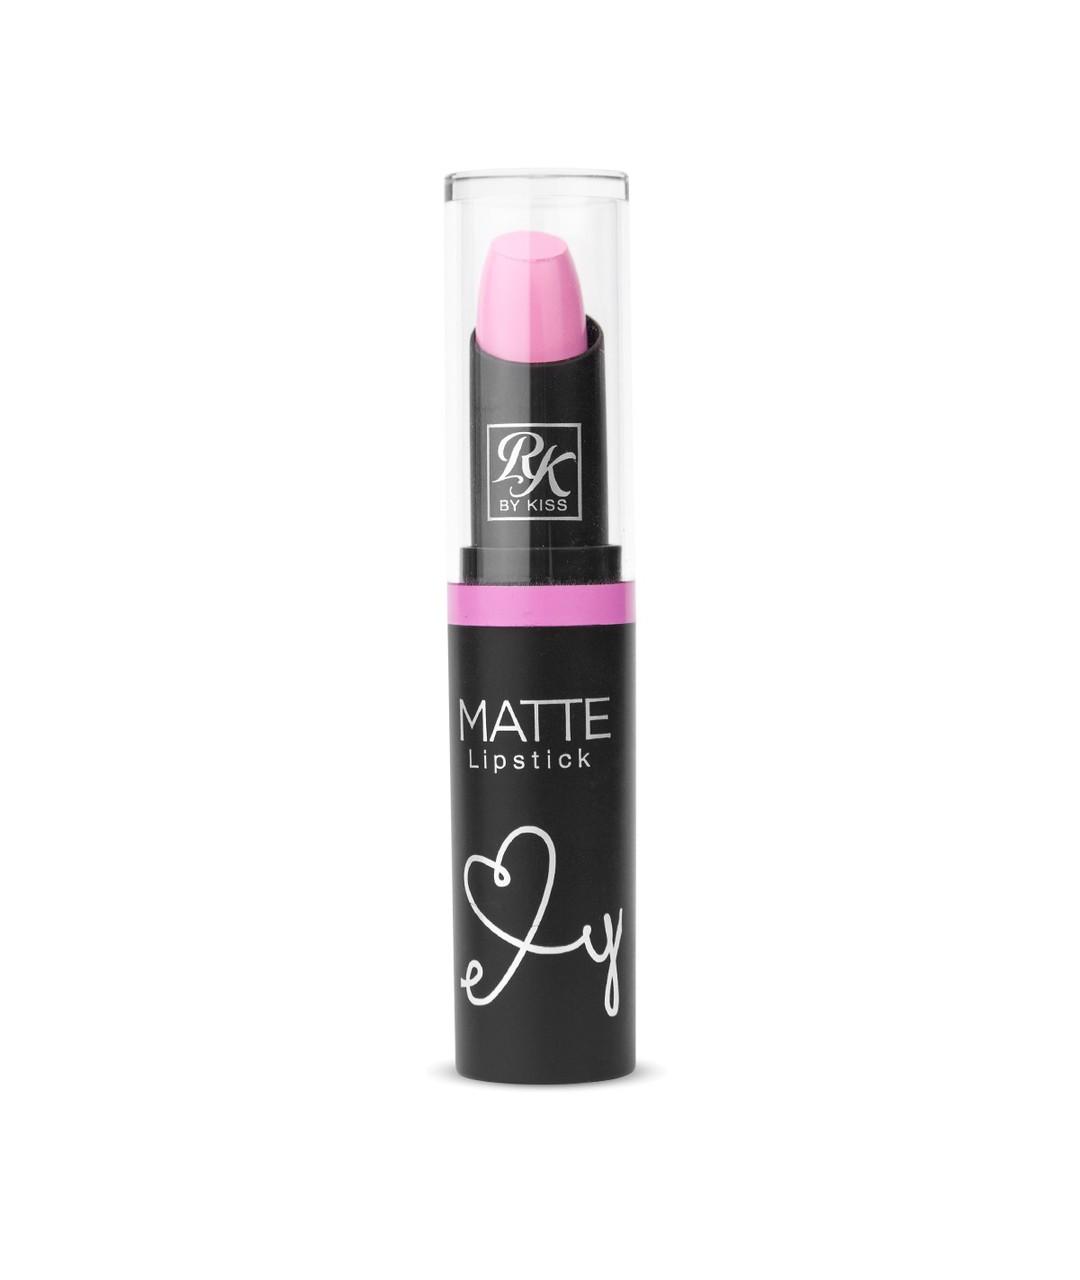 Ruby Kisses Ultra Matte Lipstick